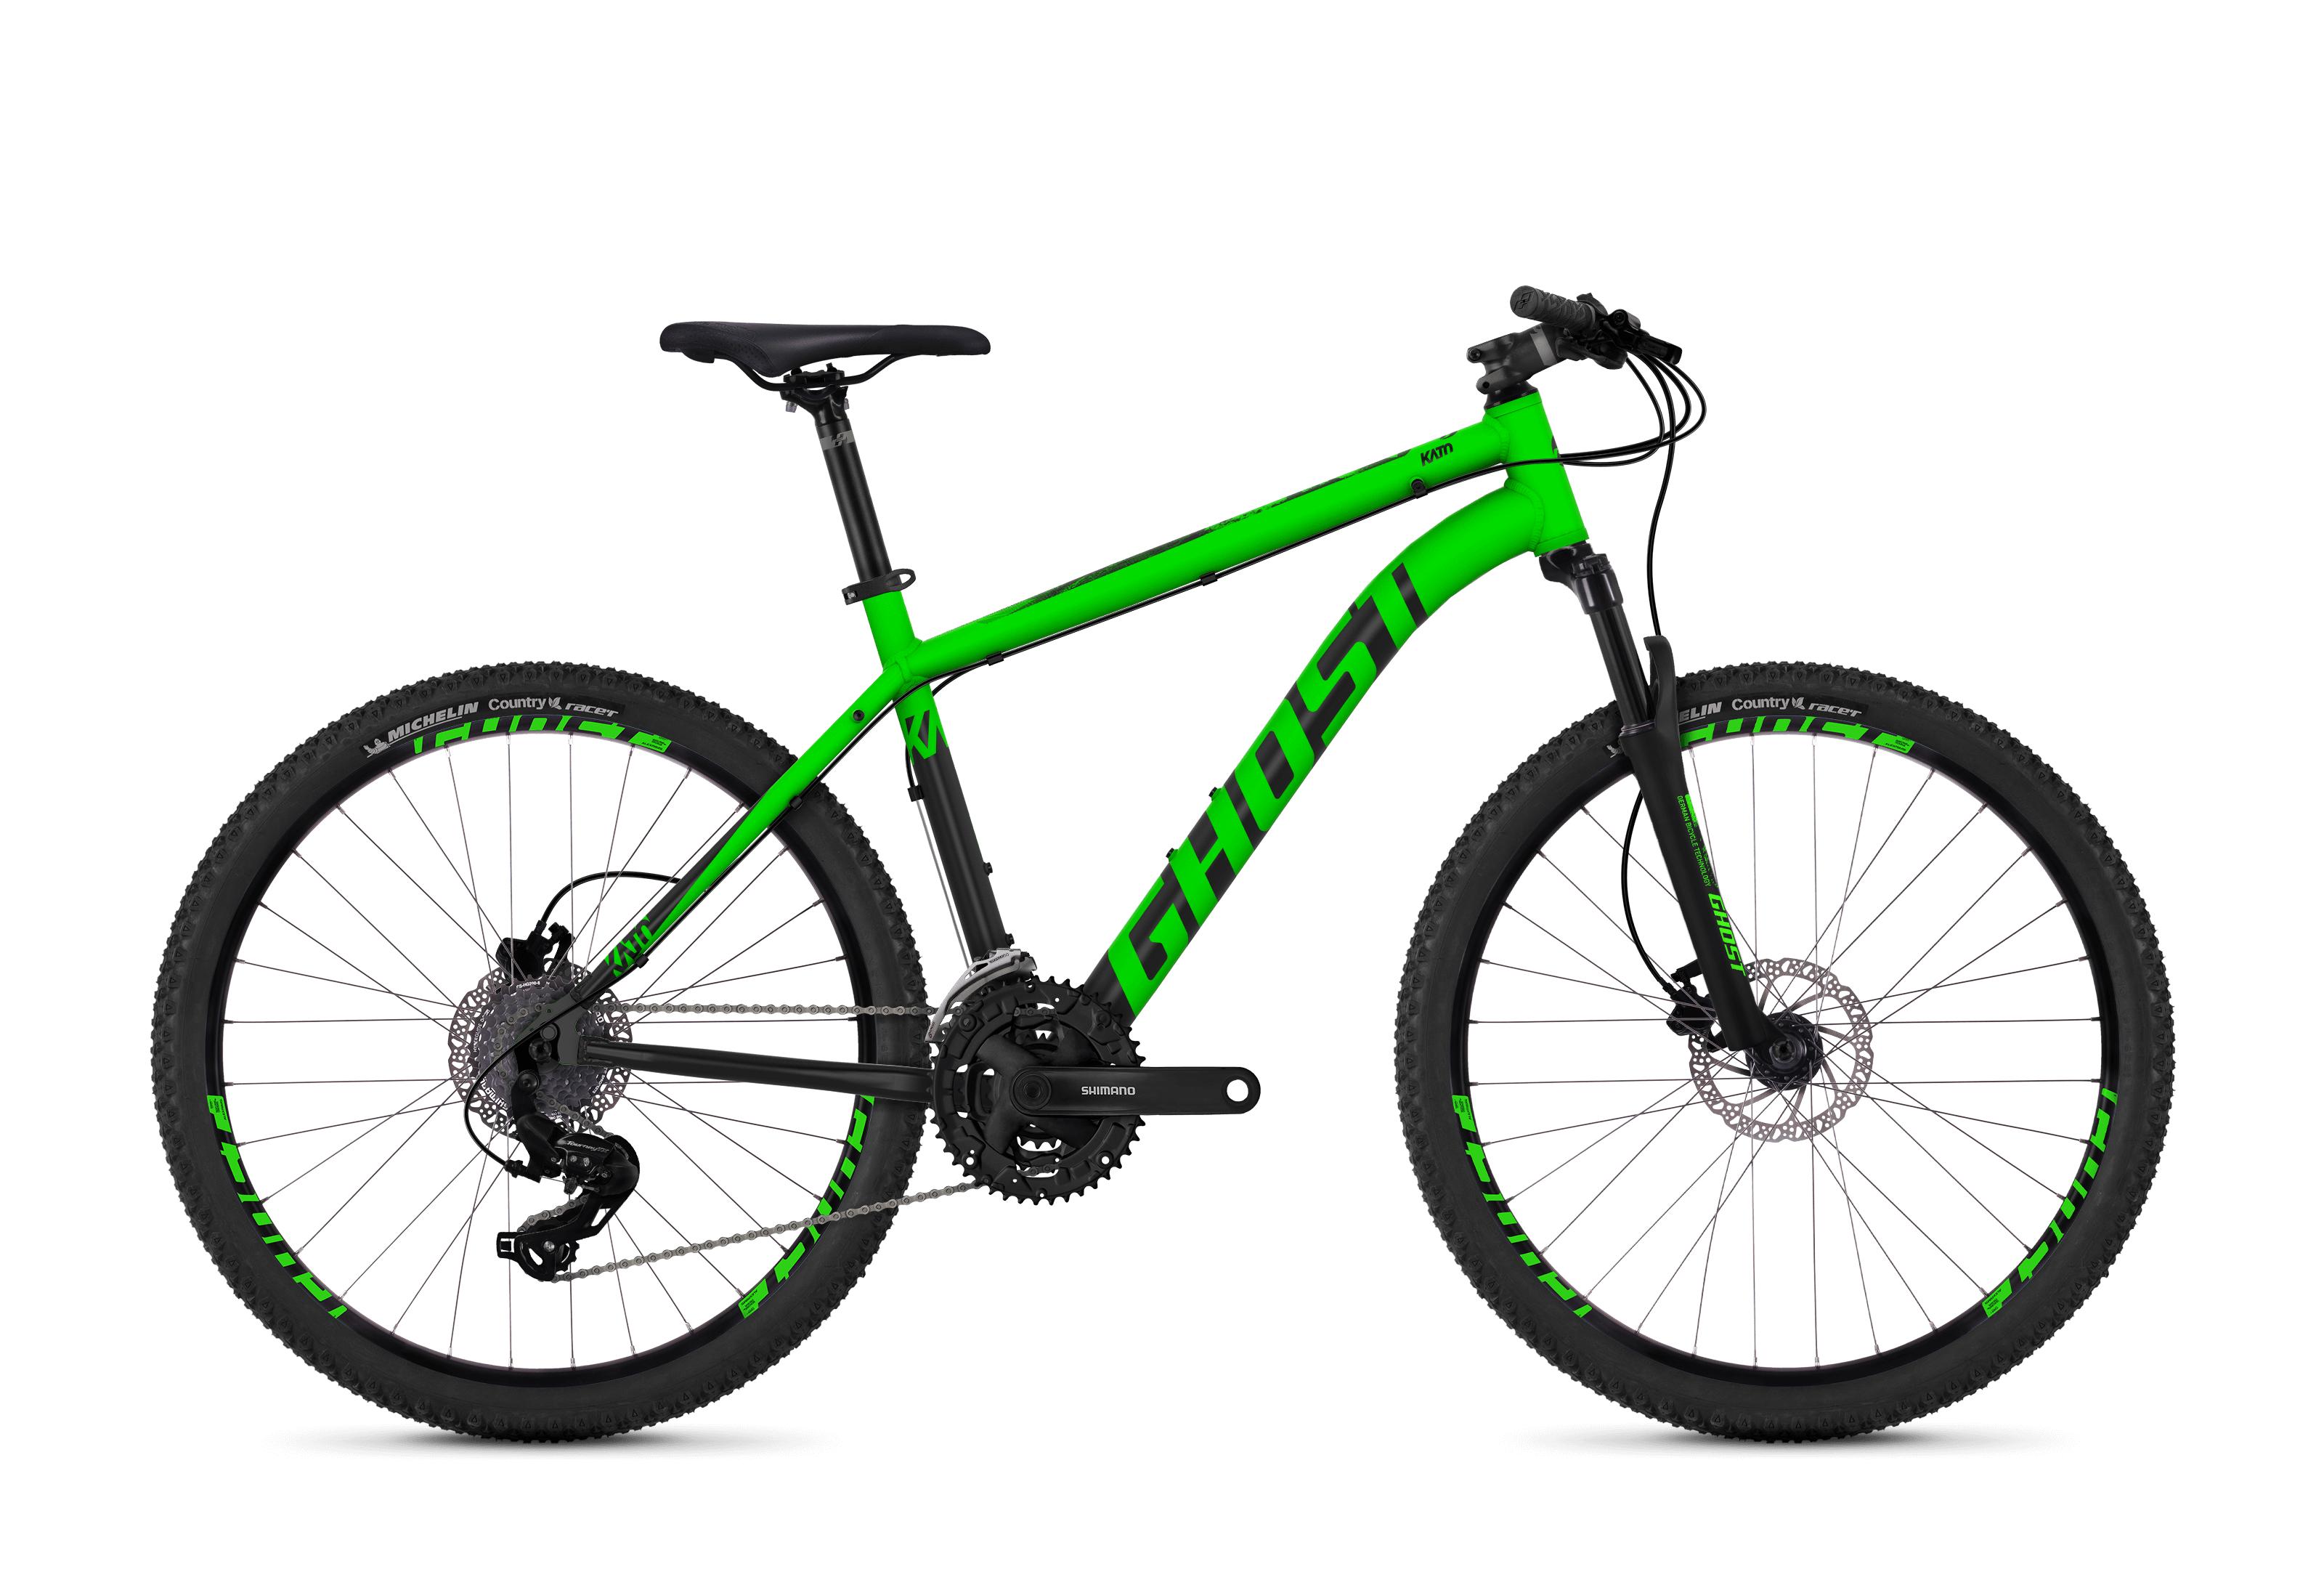 Horské kolo GHOST Kato 1.6 green / black XS 2018